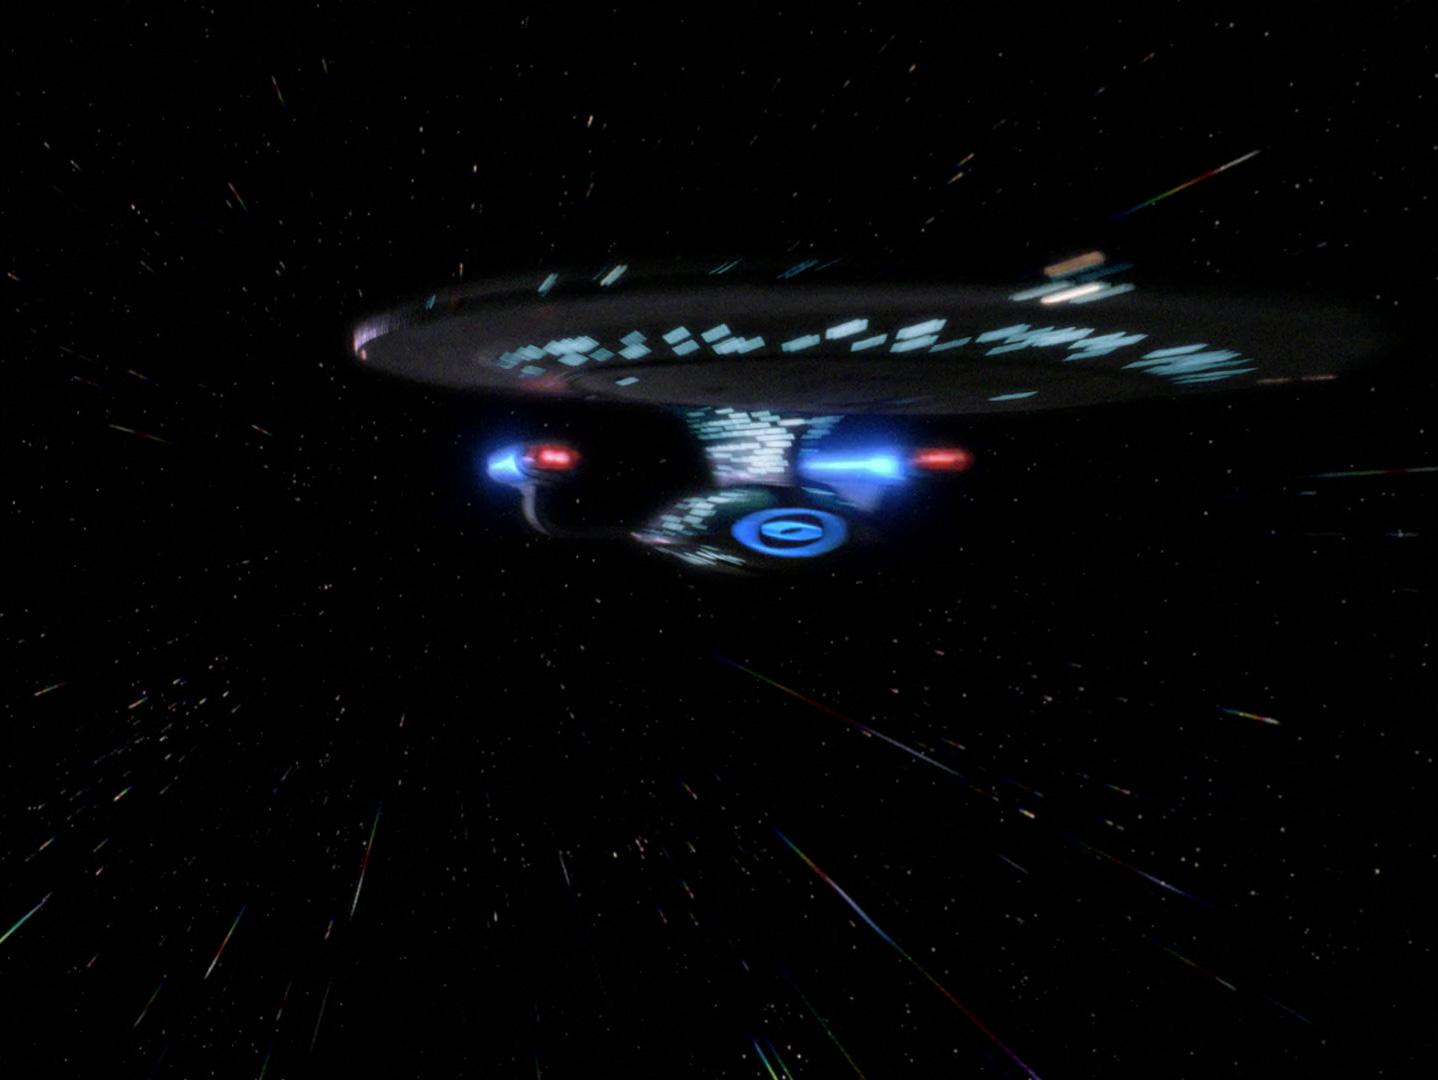 Star Trek: The Next Generation - Angriffsziel Erde (The Best Of Both Worlds, 2) Blu-ray Screencap © CBS/Paramount